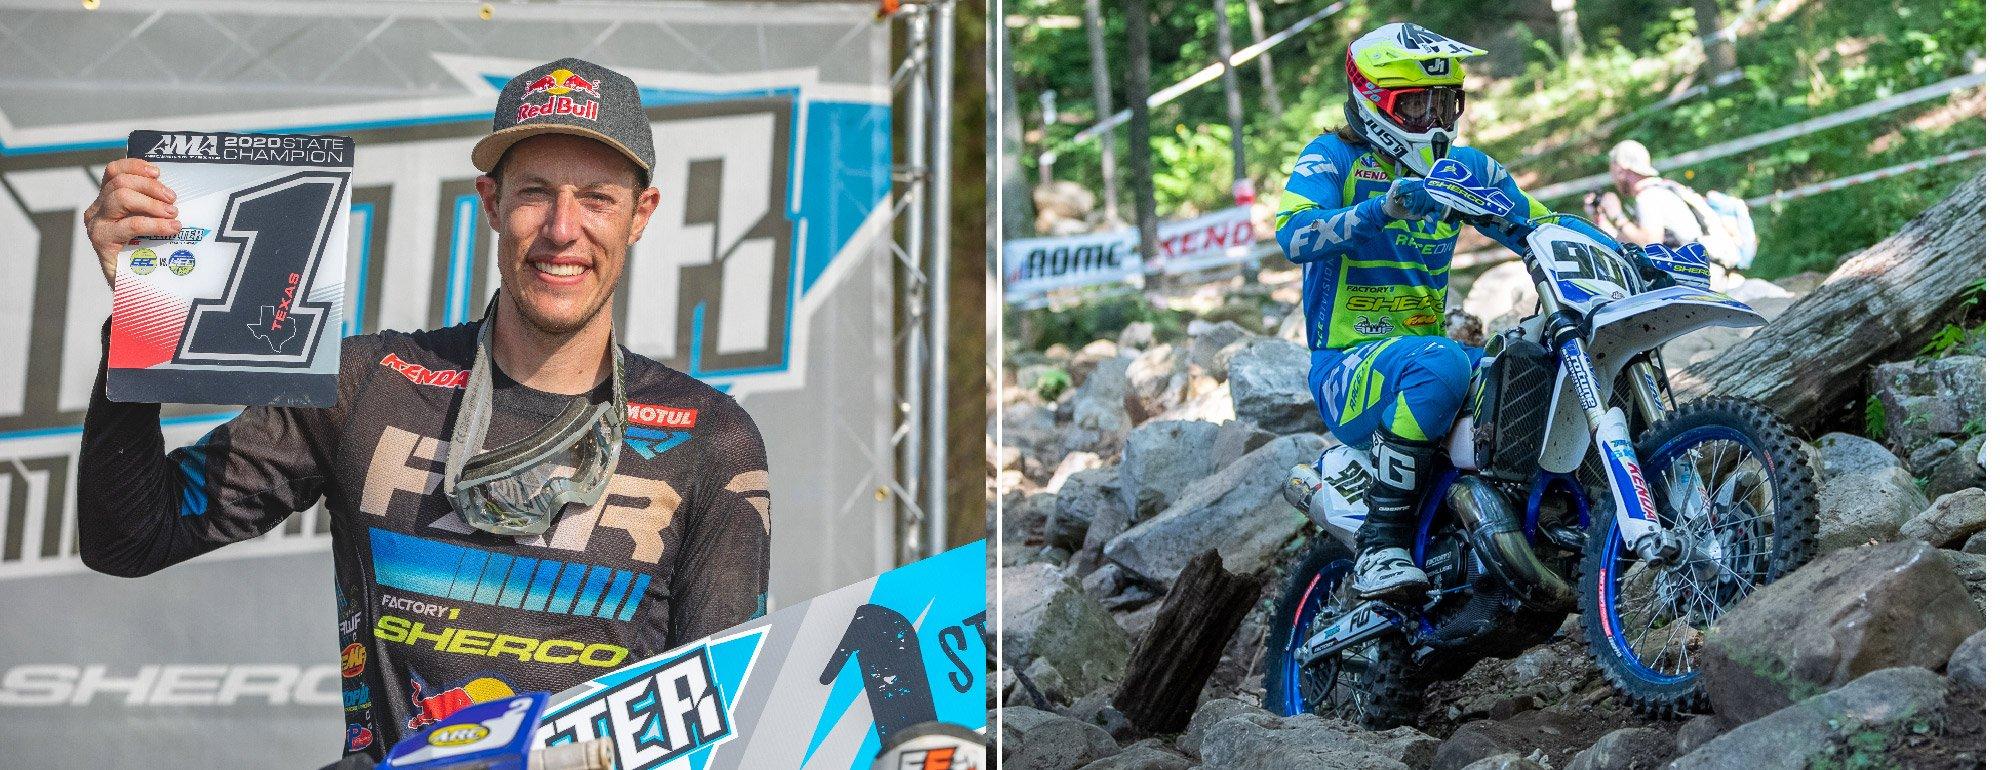 Cody Webb - Sherco - Blog Championship Photo_Champ 7